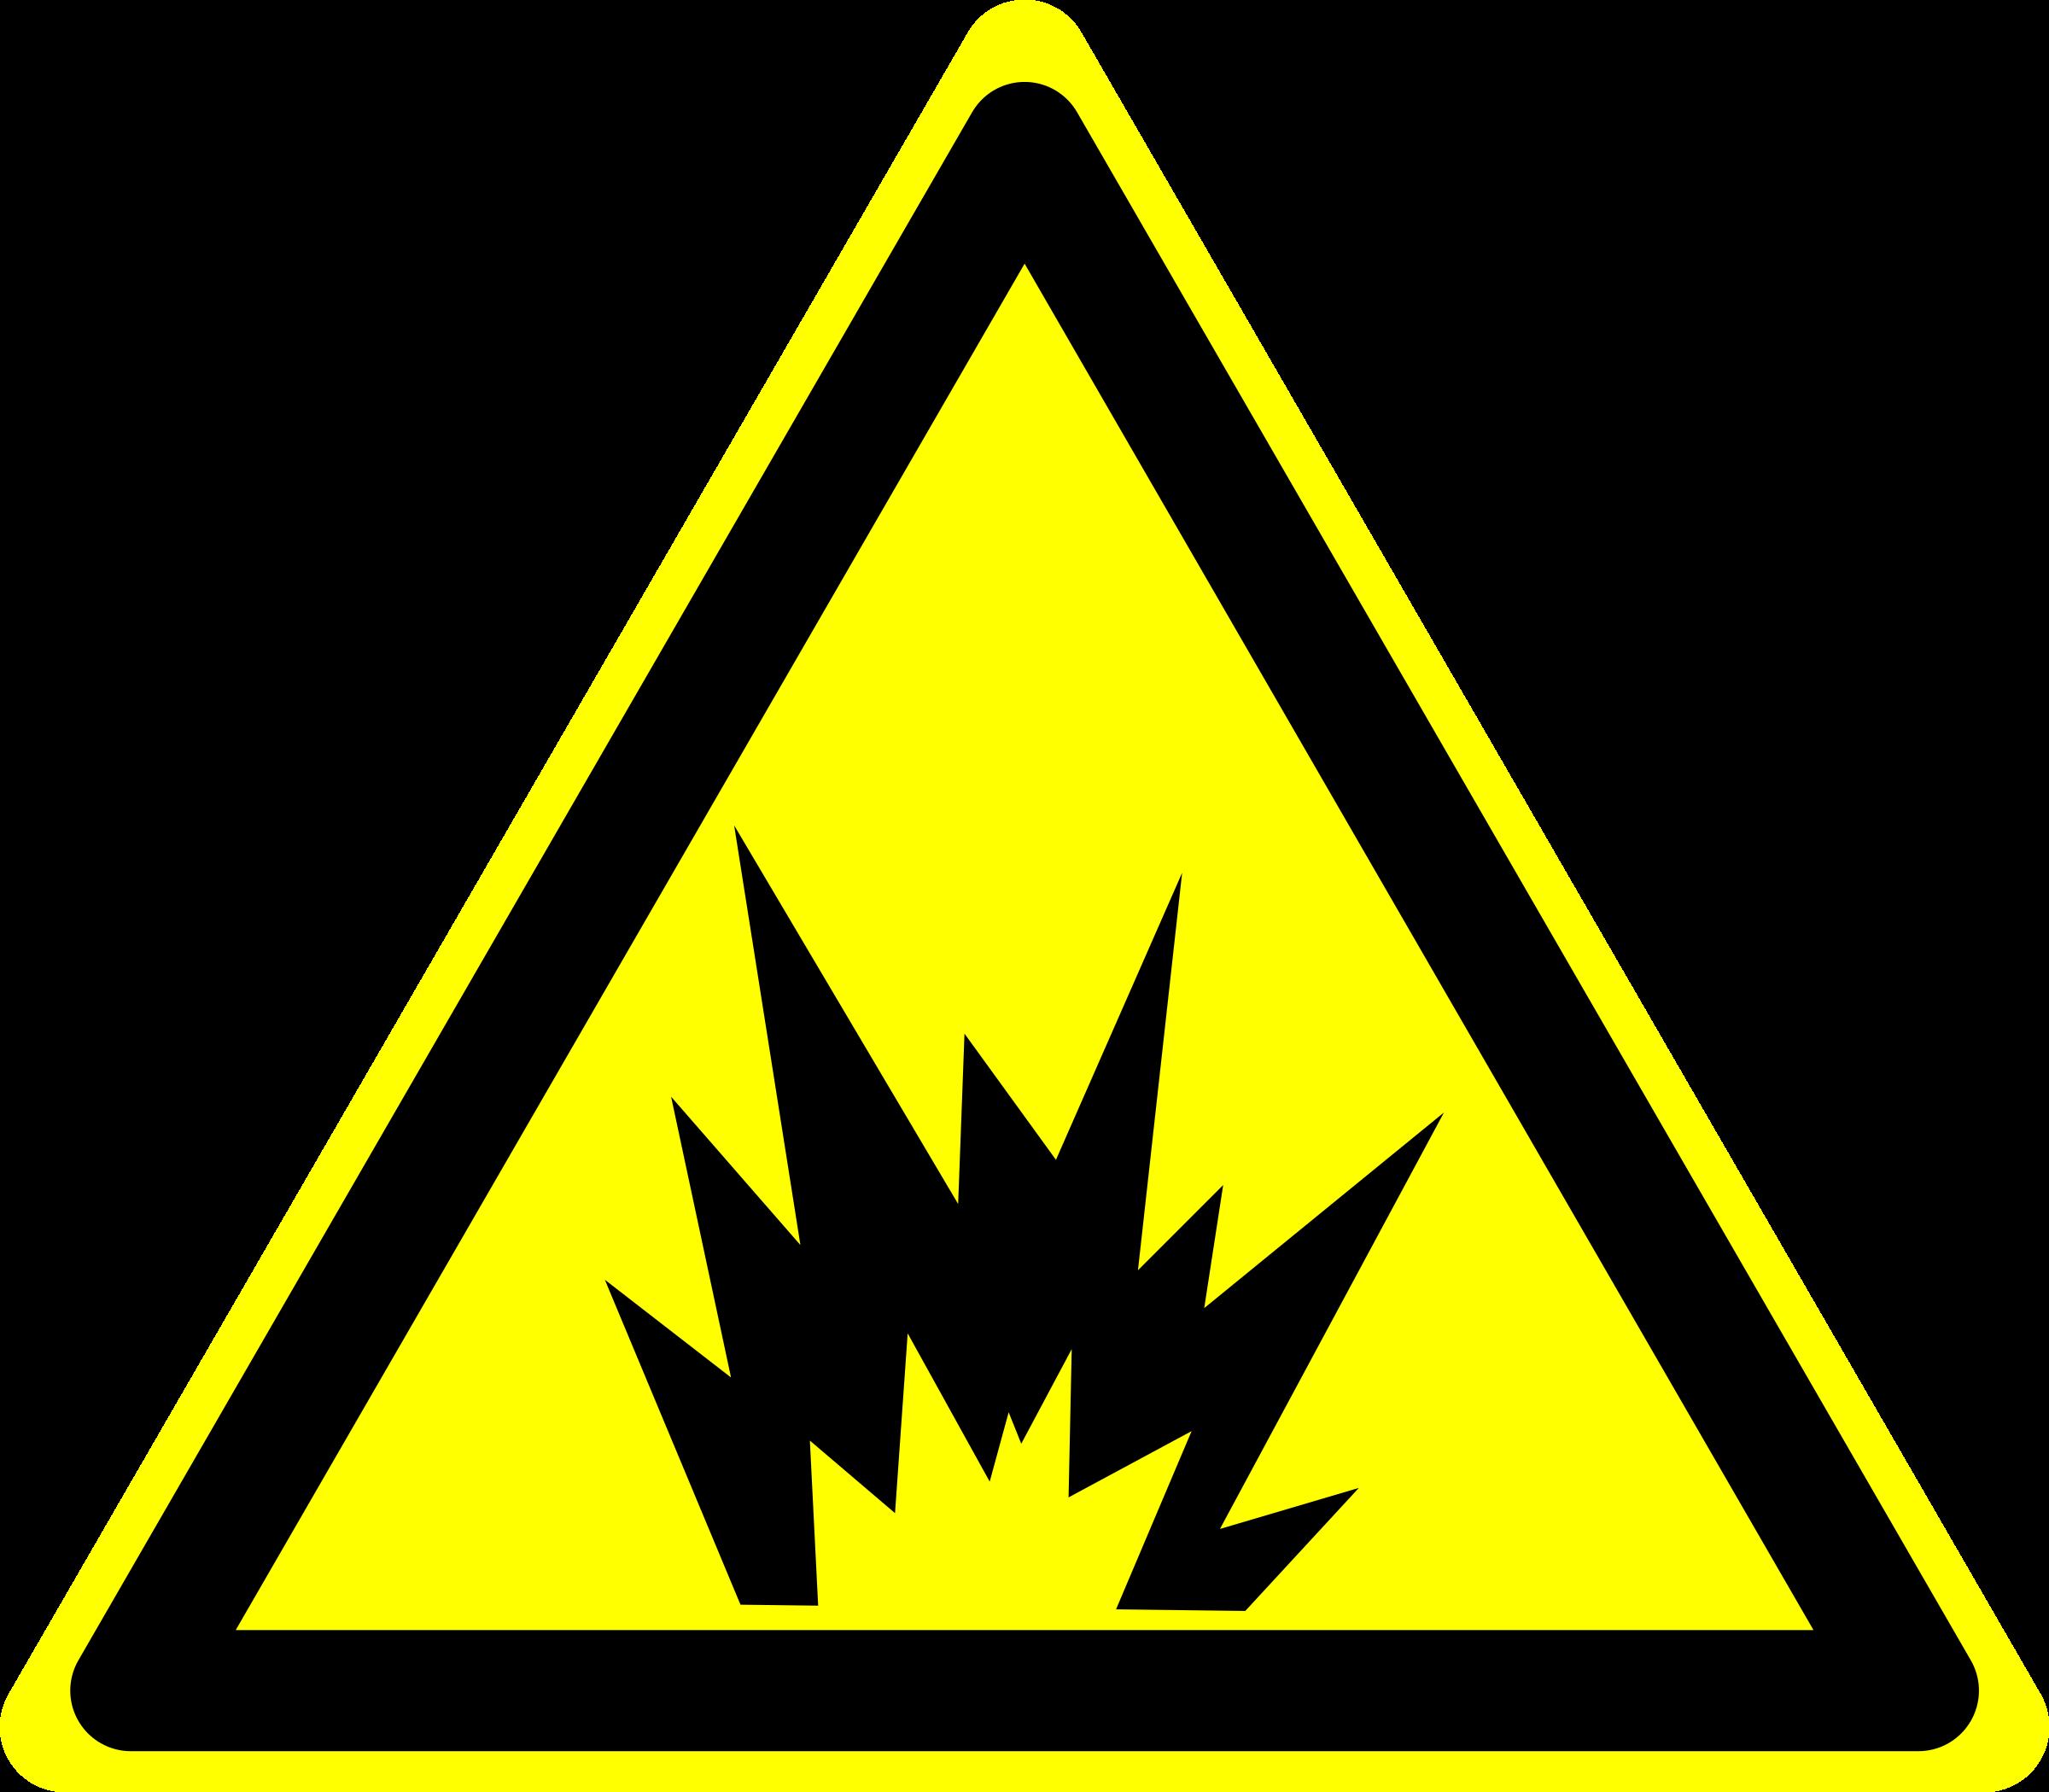 Clipart explosion office. Hazard warning sign big